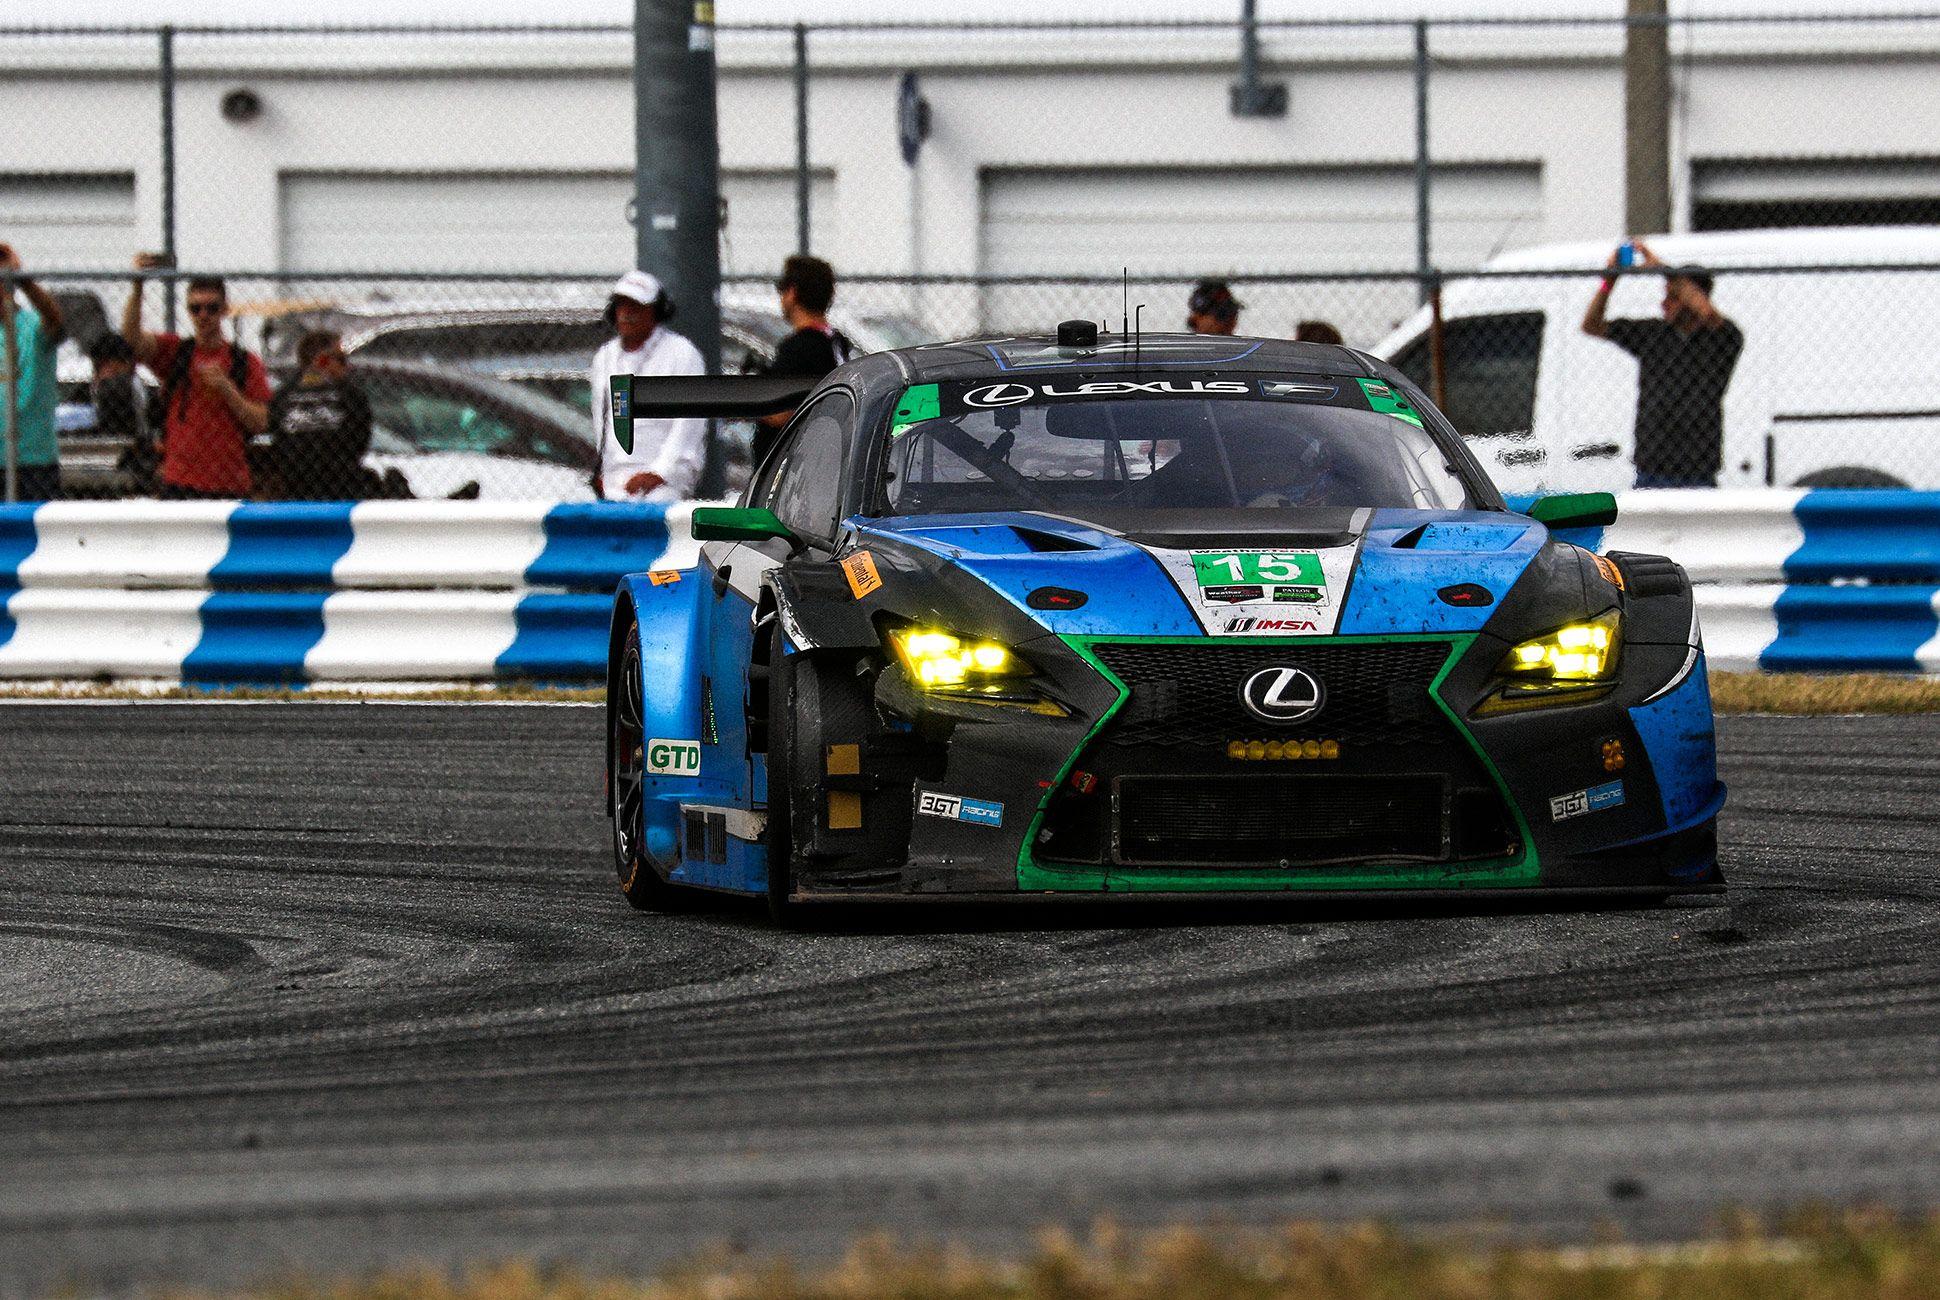 Best-Sports-Cars-of-2018-Daytona-24-Hours-gear-patrol-Lexus-RC-F-GT3-1